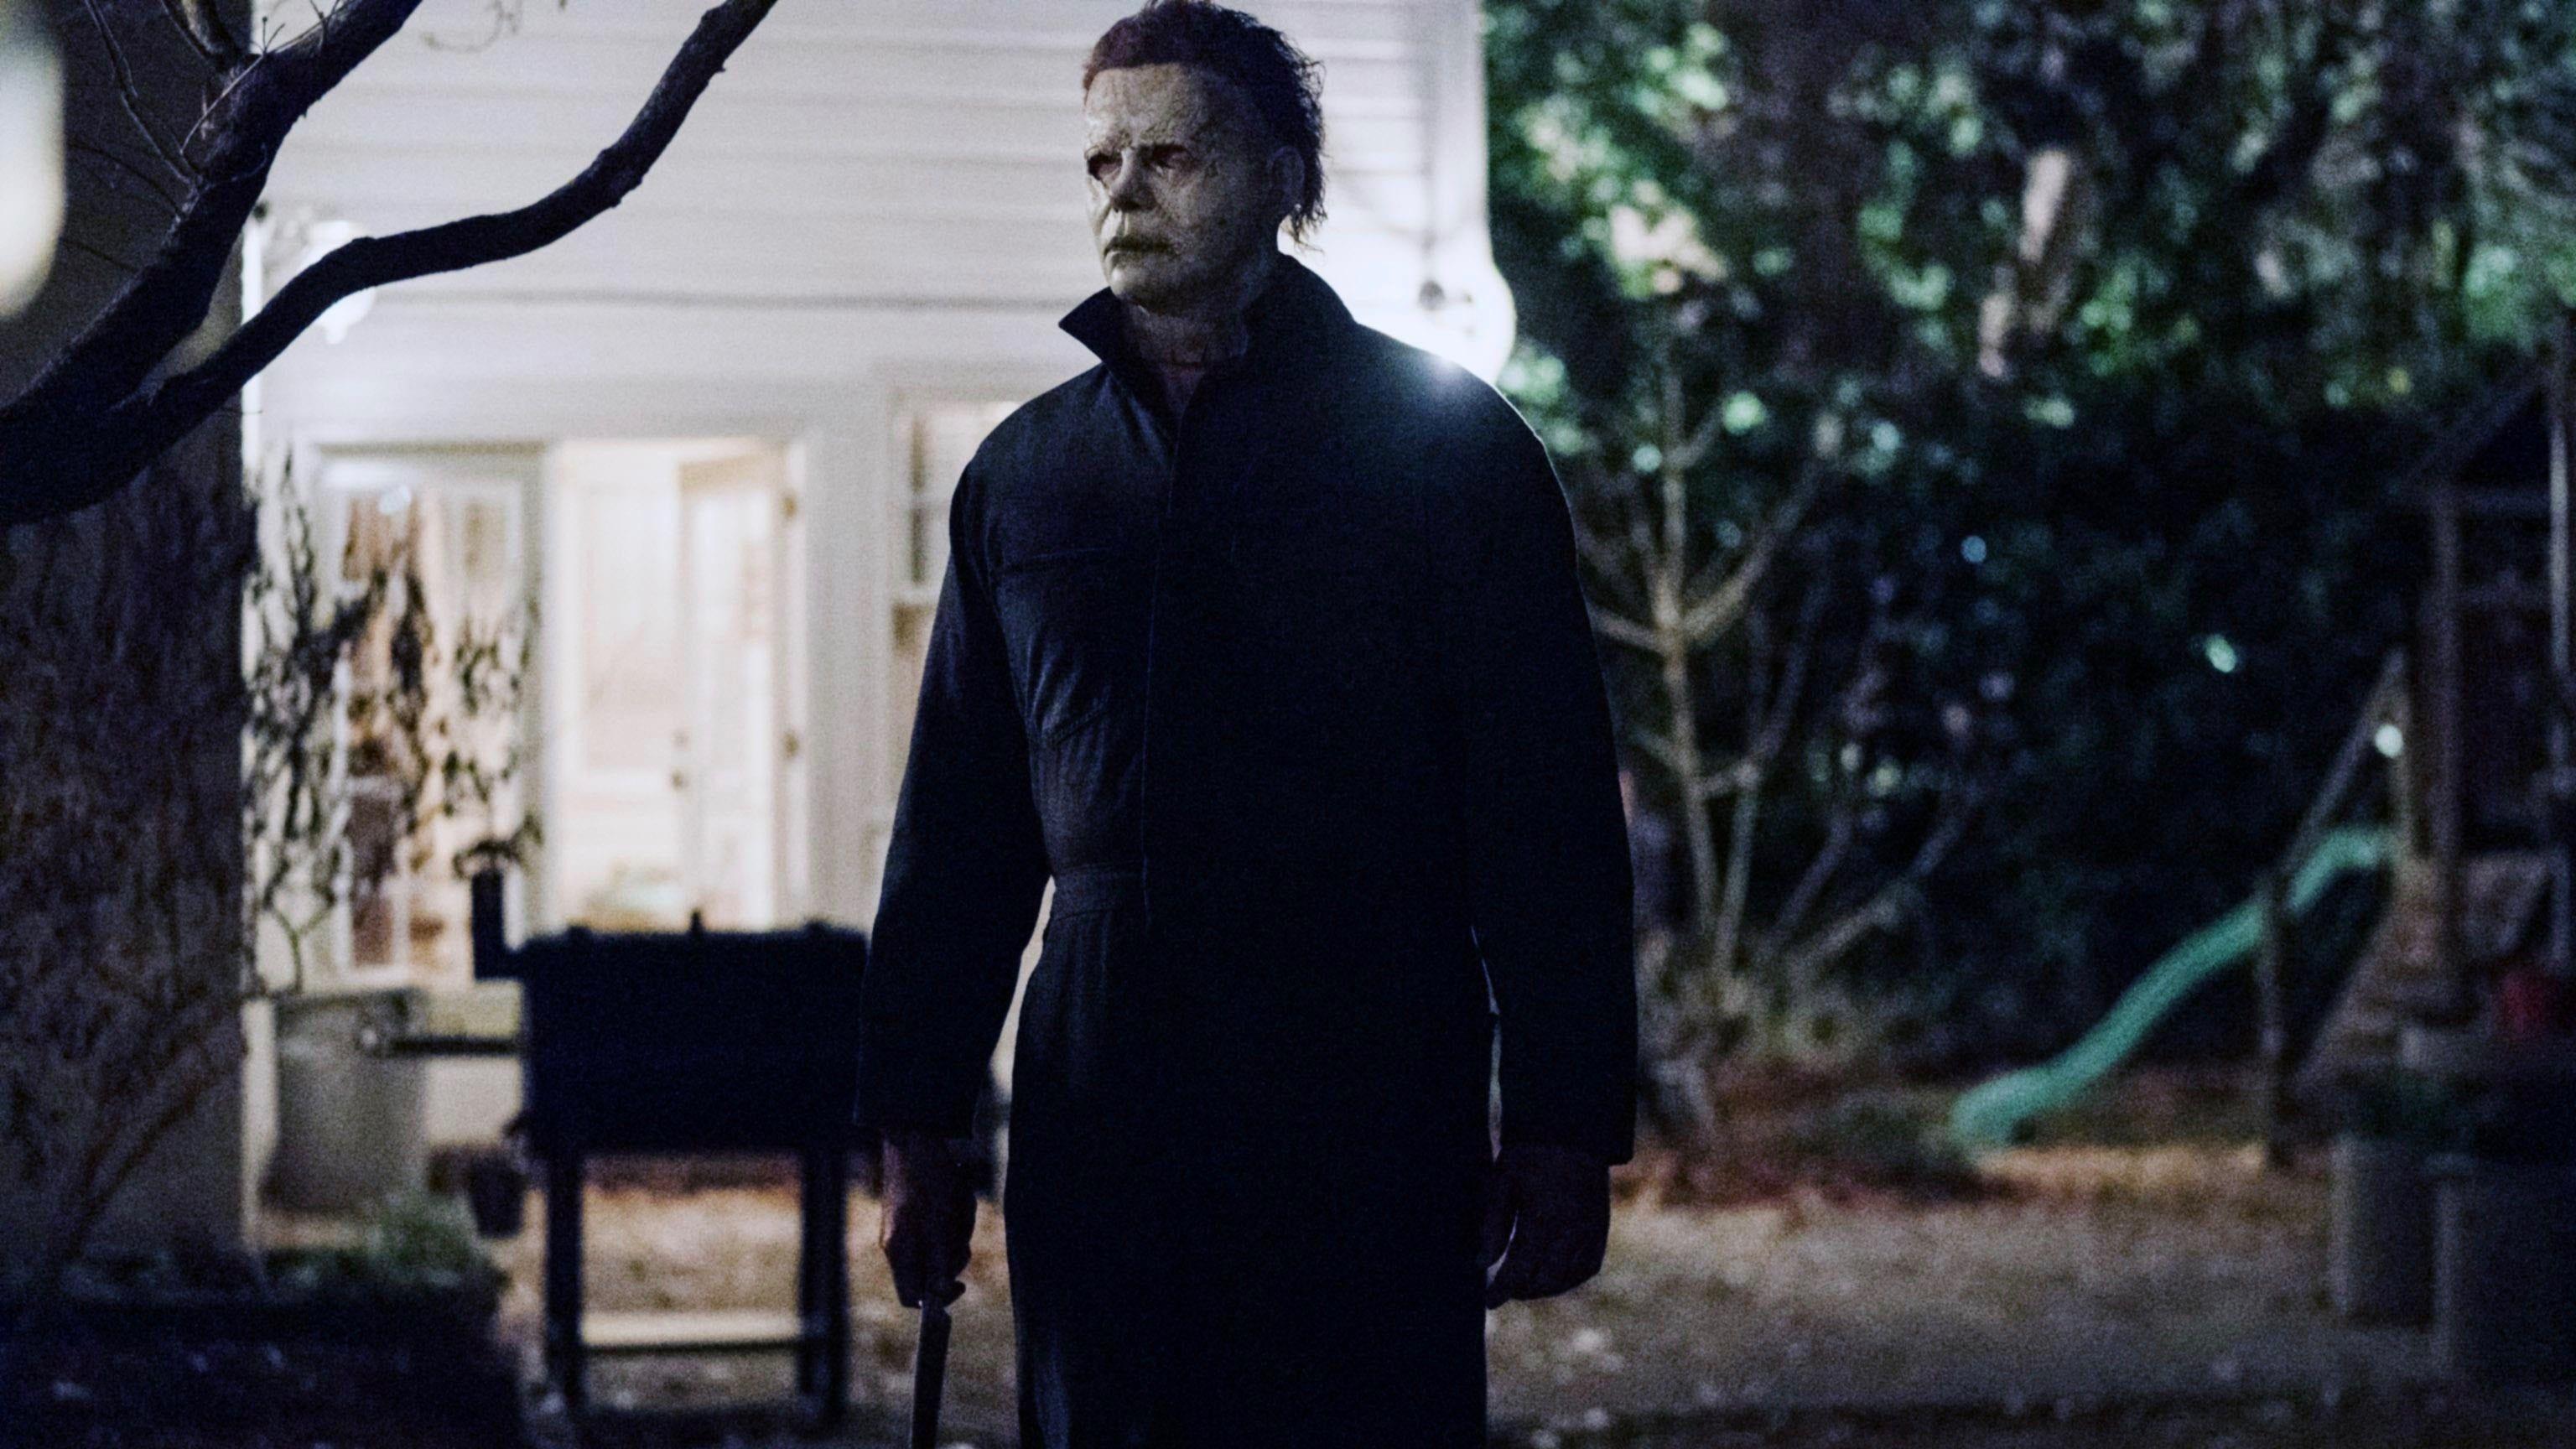 Pin On Ver La Noche De Halloween 2018 P E L I C U L A Completa En Linea Hd 1080p